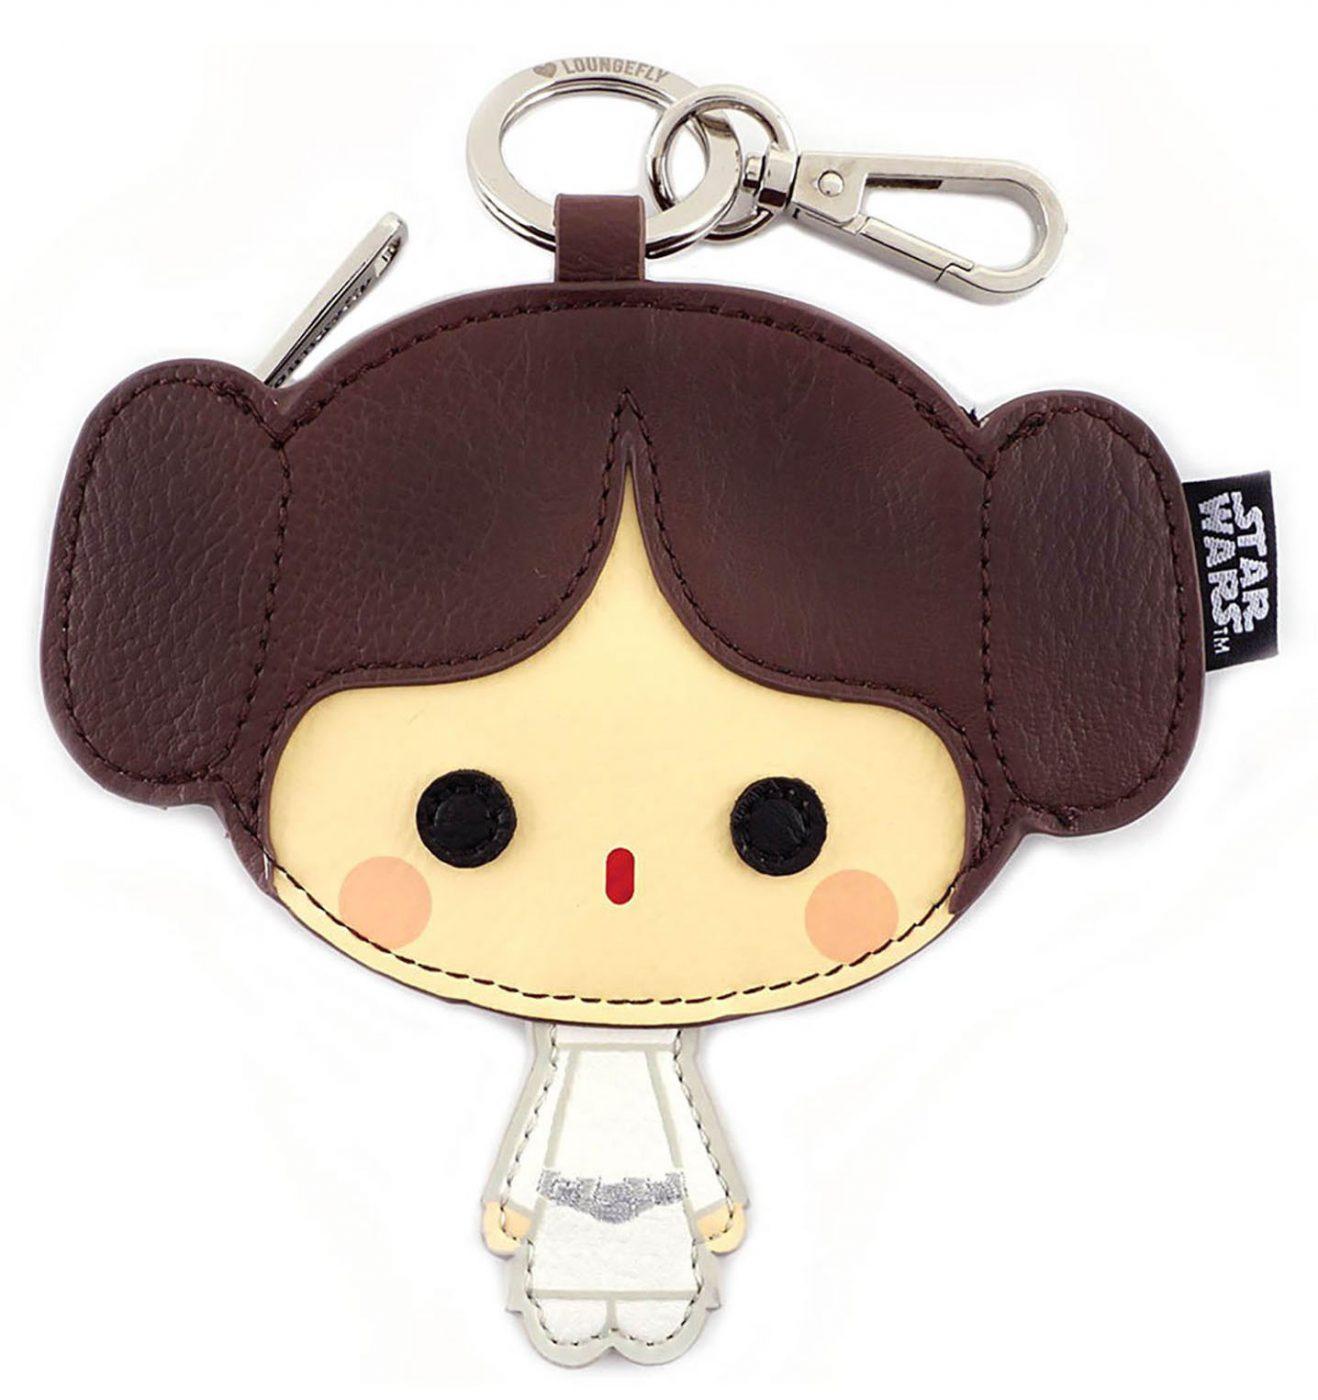 Loungefly Star Wars Princess Leia Kawaii Coin Bag